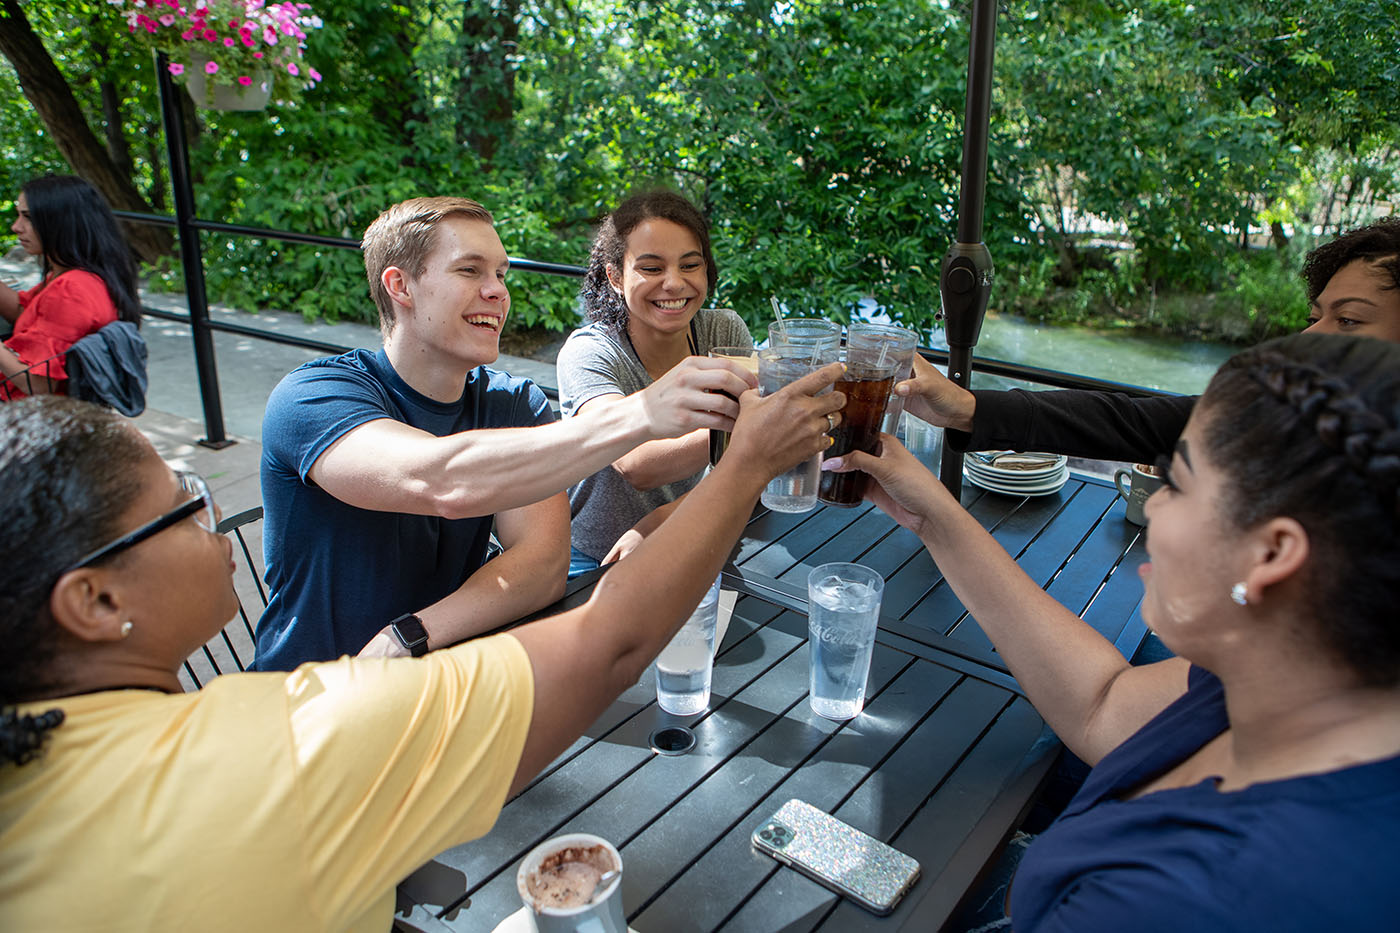 Ogden Restaurant Week has been an important part of the Ogden food scene since 2013.